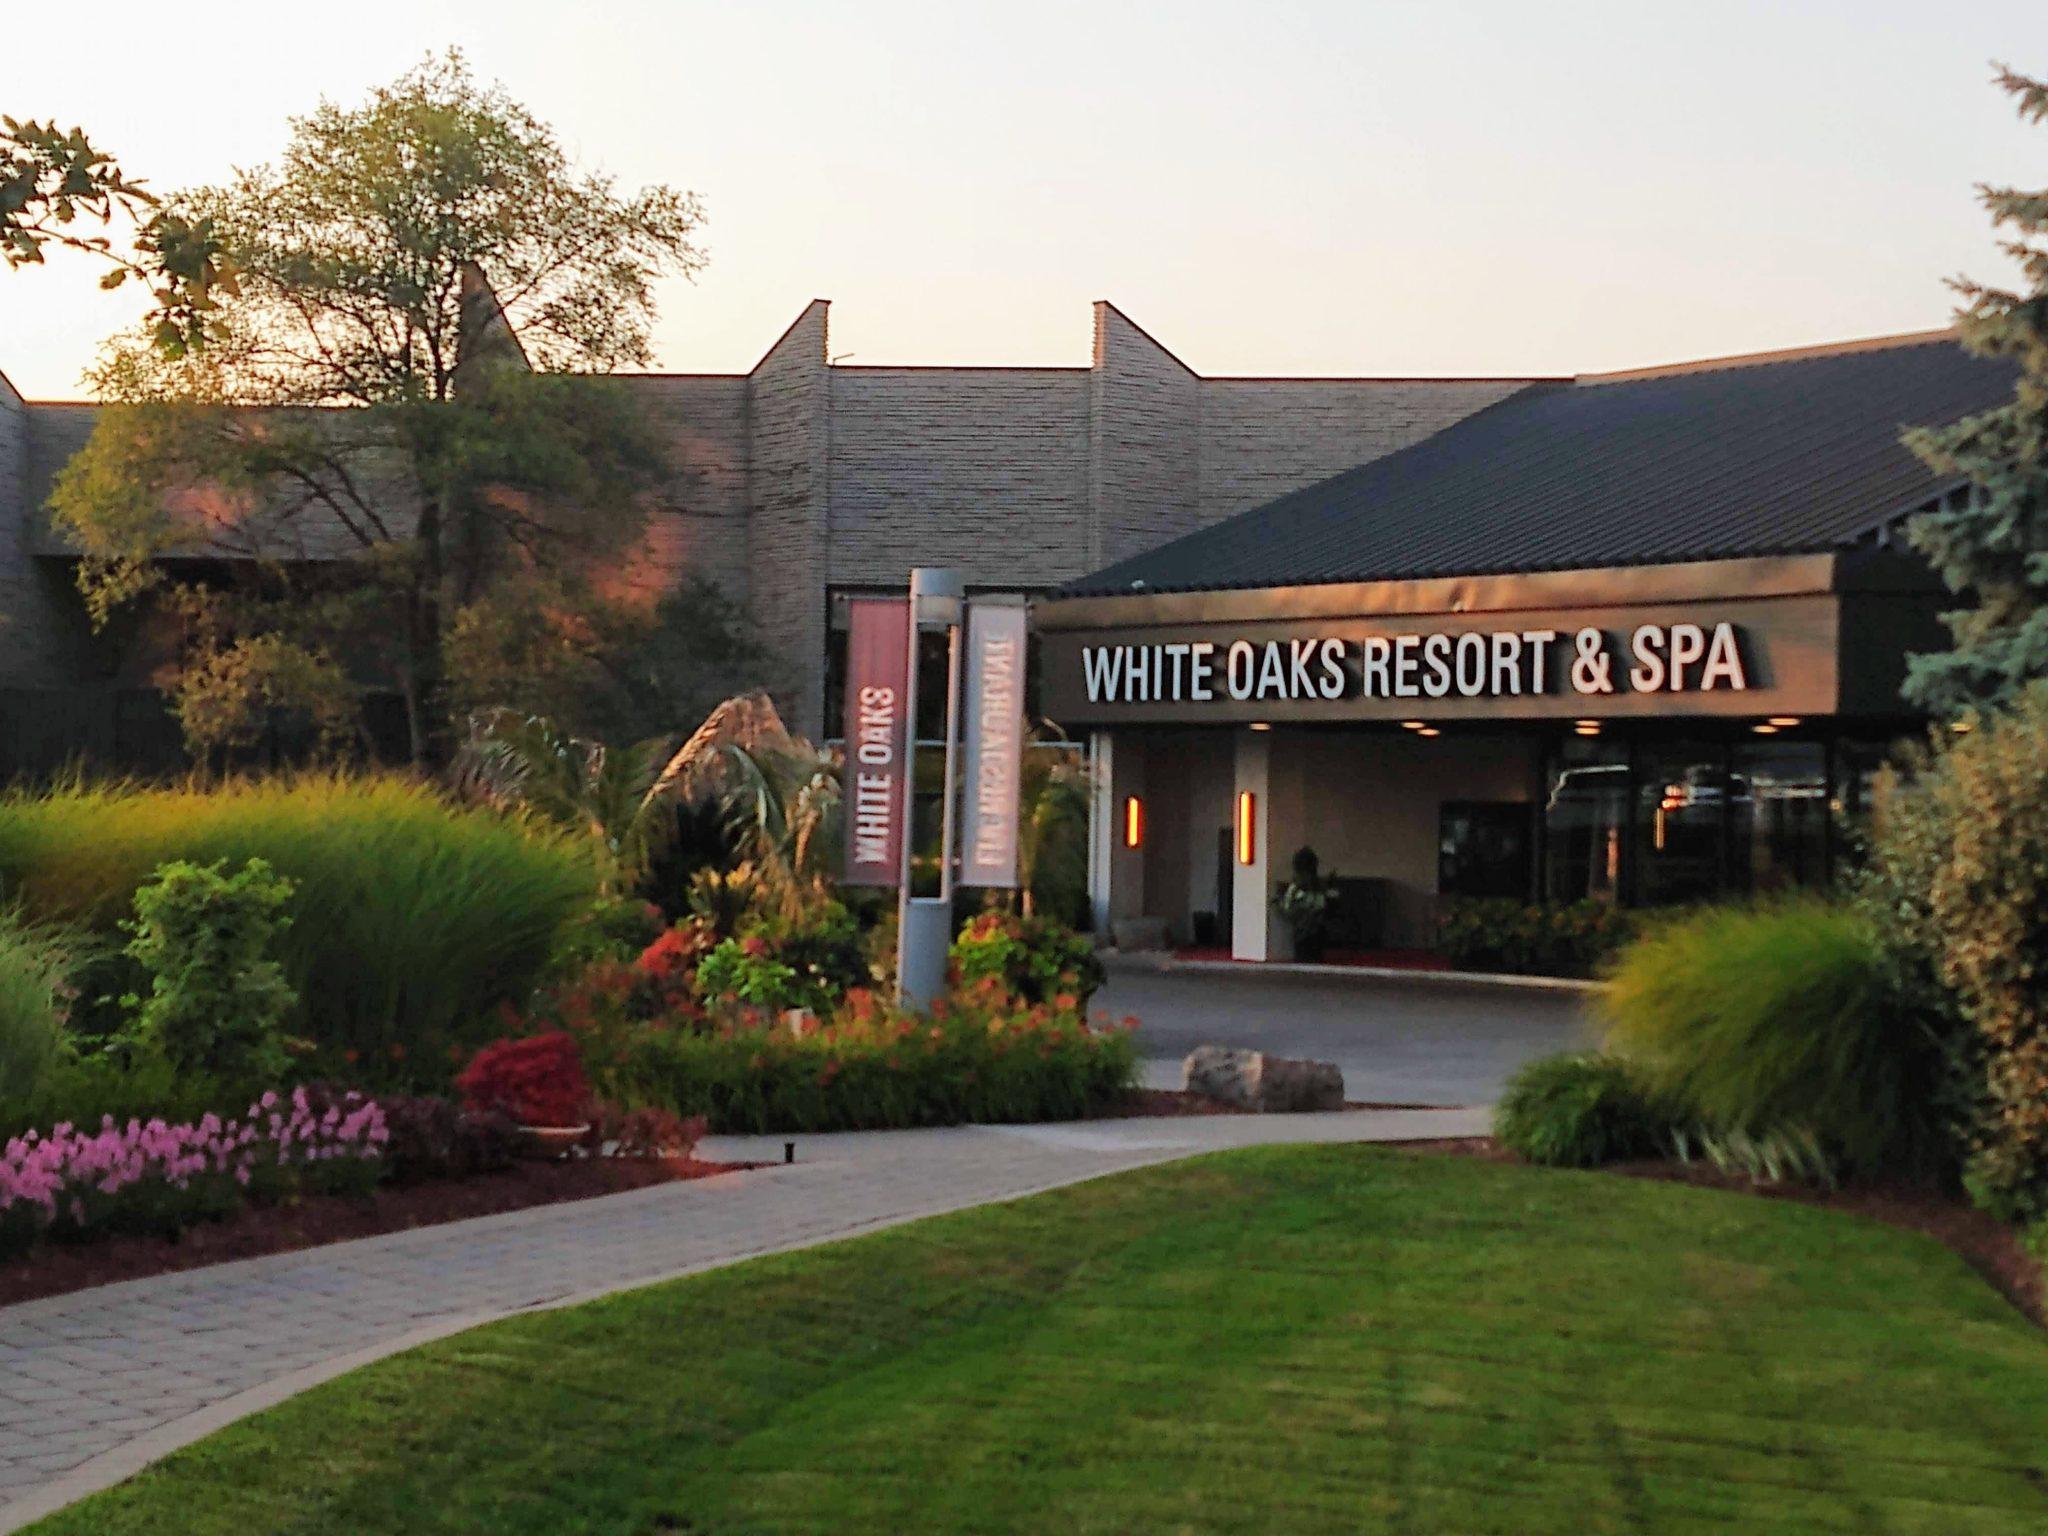 White Oaks Spa & Resort Niagara-on-the-Lake Ontario Canada